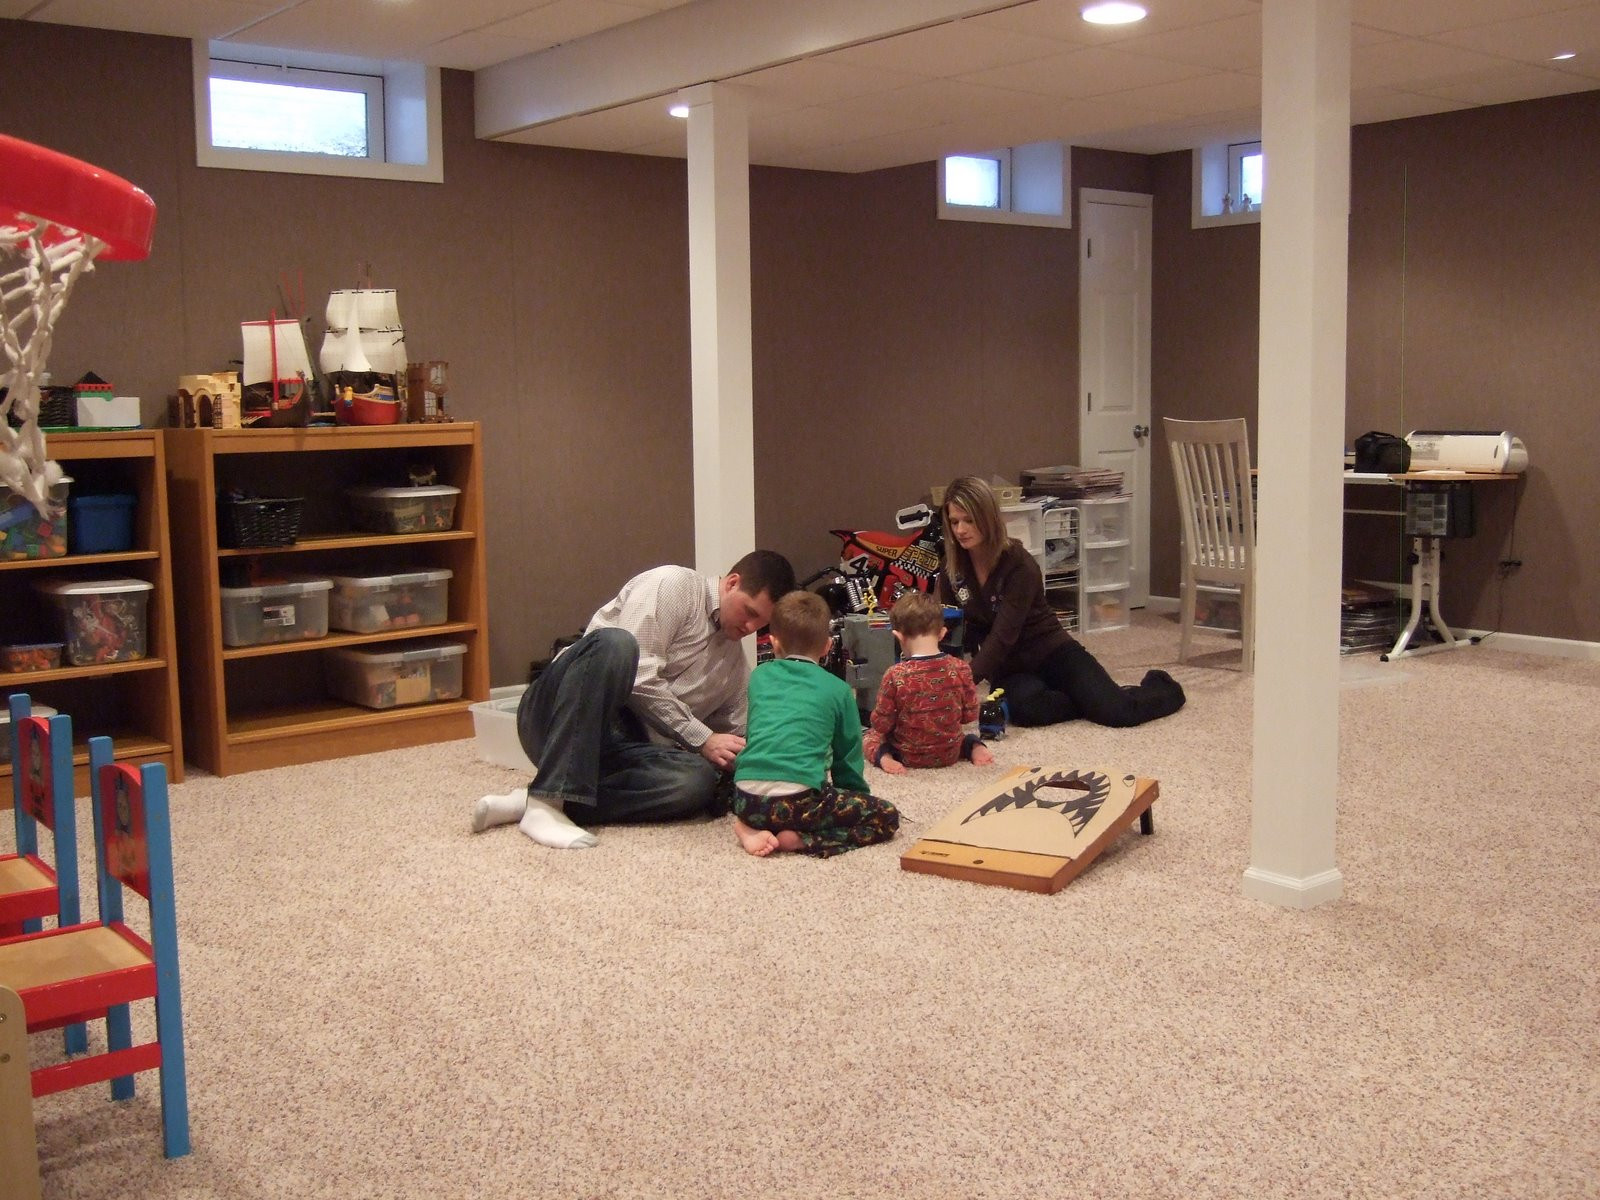 Best ideas about Basement Ideas Diy . Save or Pin A DIY basement Now.